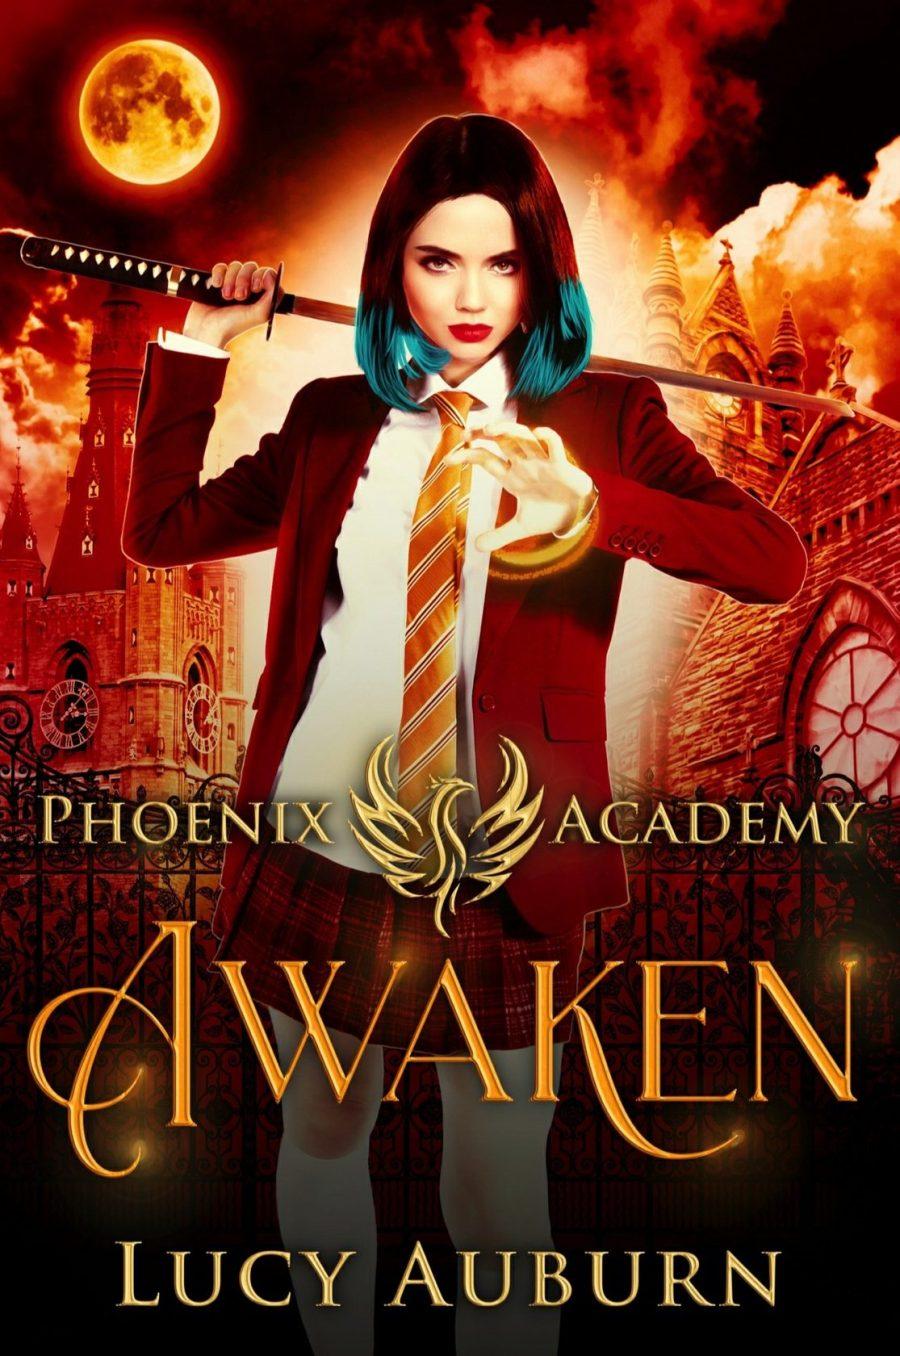 Awaken *Phoenix Academy - Book 1* by Lucy Auburn - A Book Review #BookReview #UrbanFantasy #RH #WhyChoose #ReverseHarem #SlowBurn